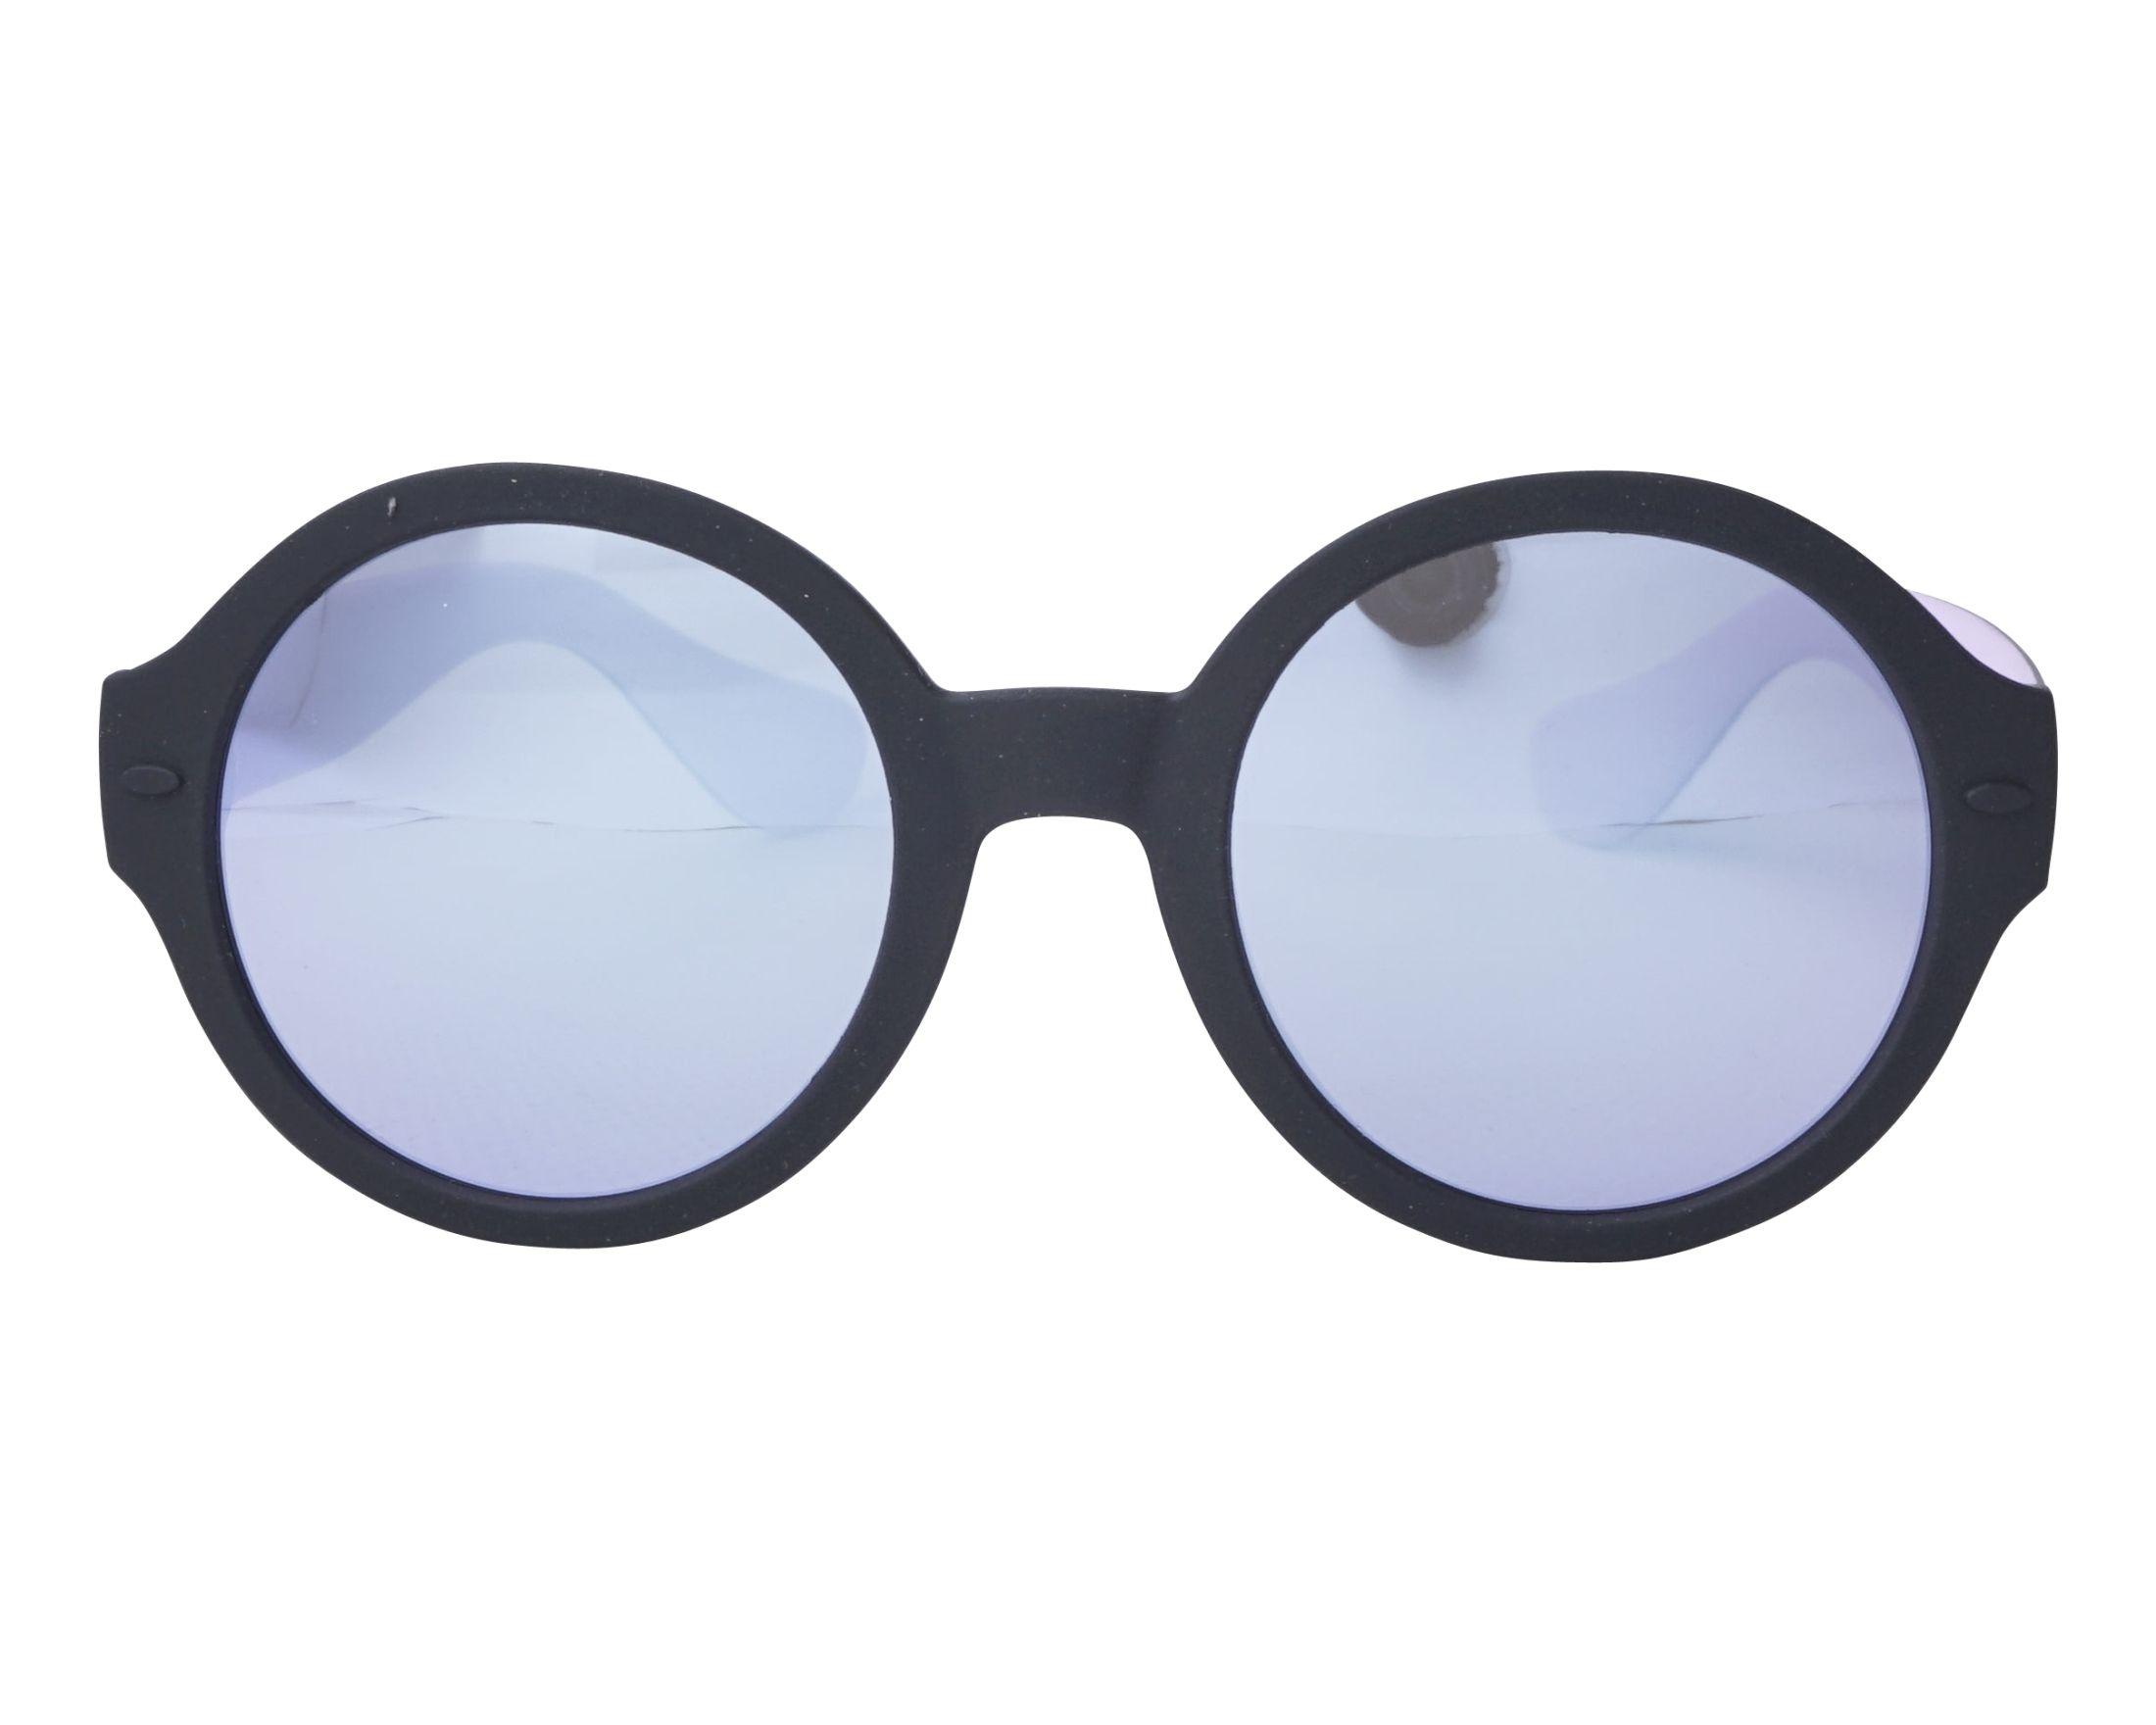 eb7c09c4c9 Gafas de sol Havaianas FLORIPA-M HK8IH 51-23 Negra Lila vista de frente